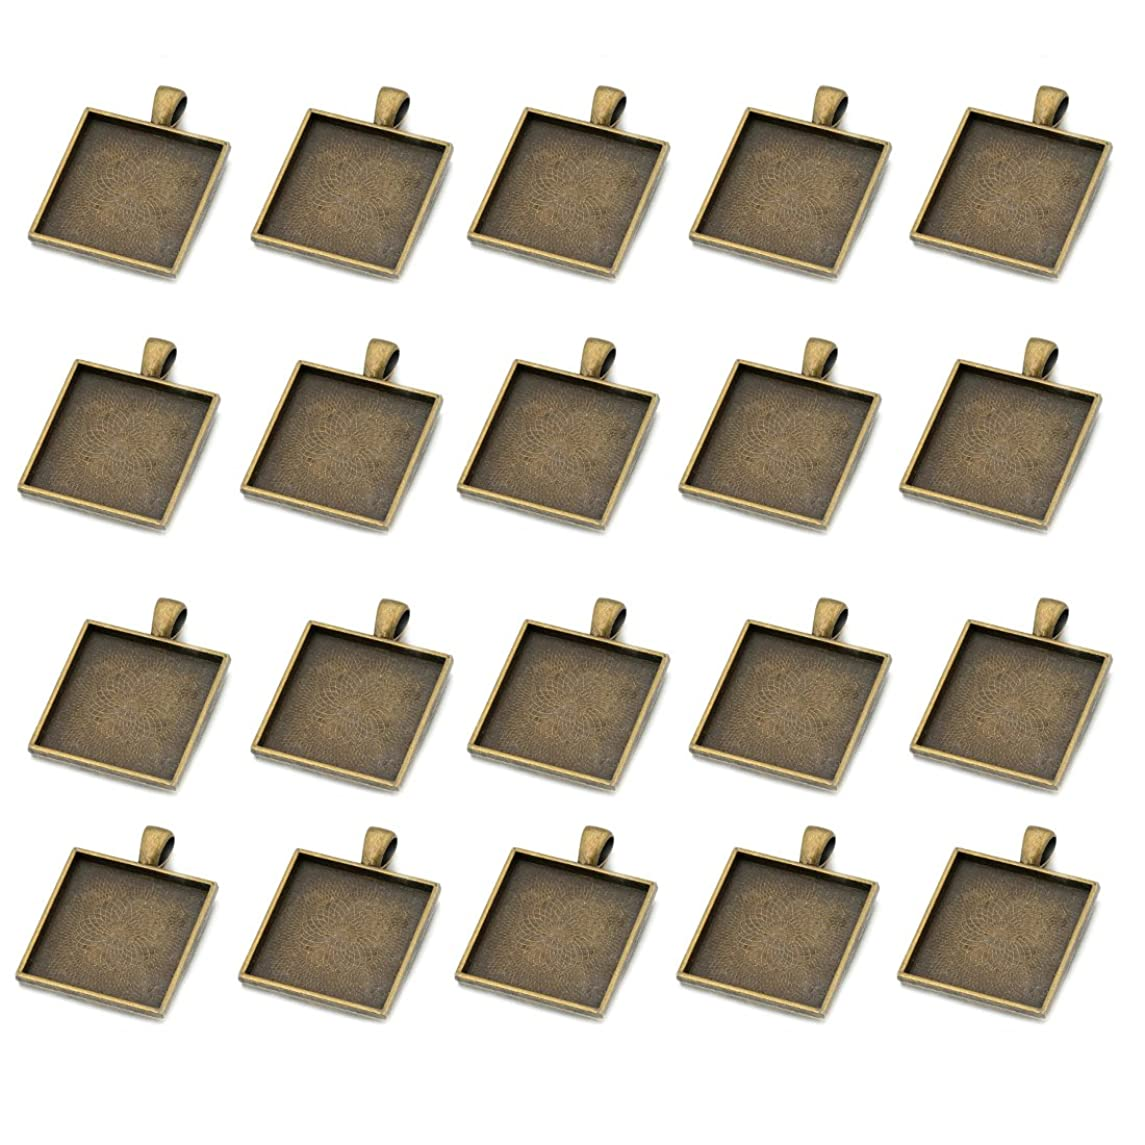 IGOGO 20 PCS Square Pendant Trays Pendant Blanks Cameo Bezel Cabochon Settings 25x25 mm Antique Bronze Color